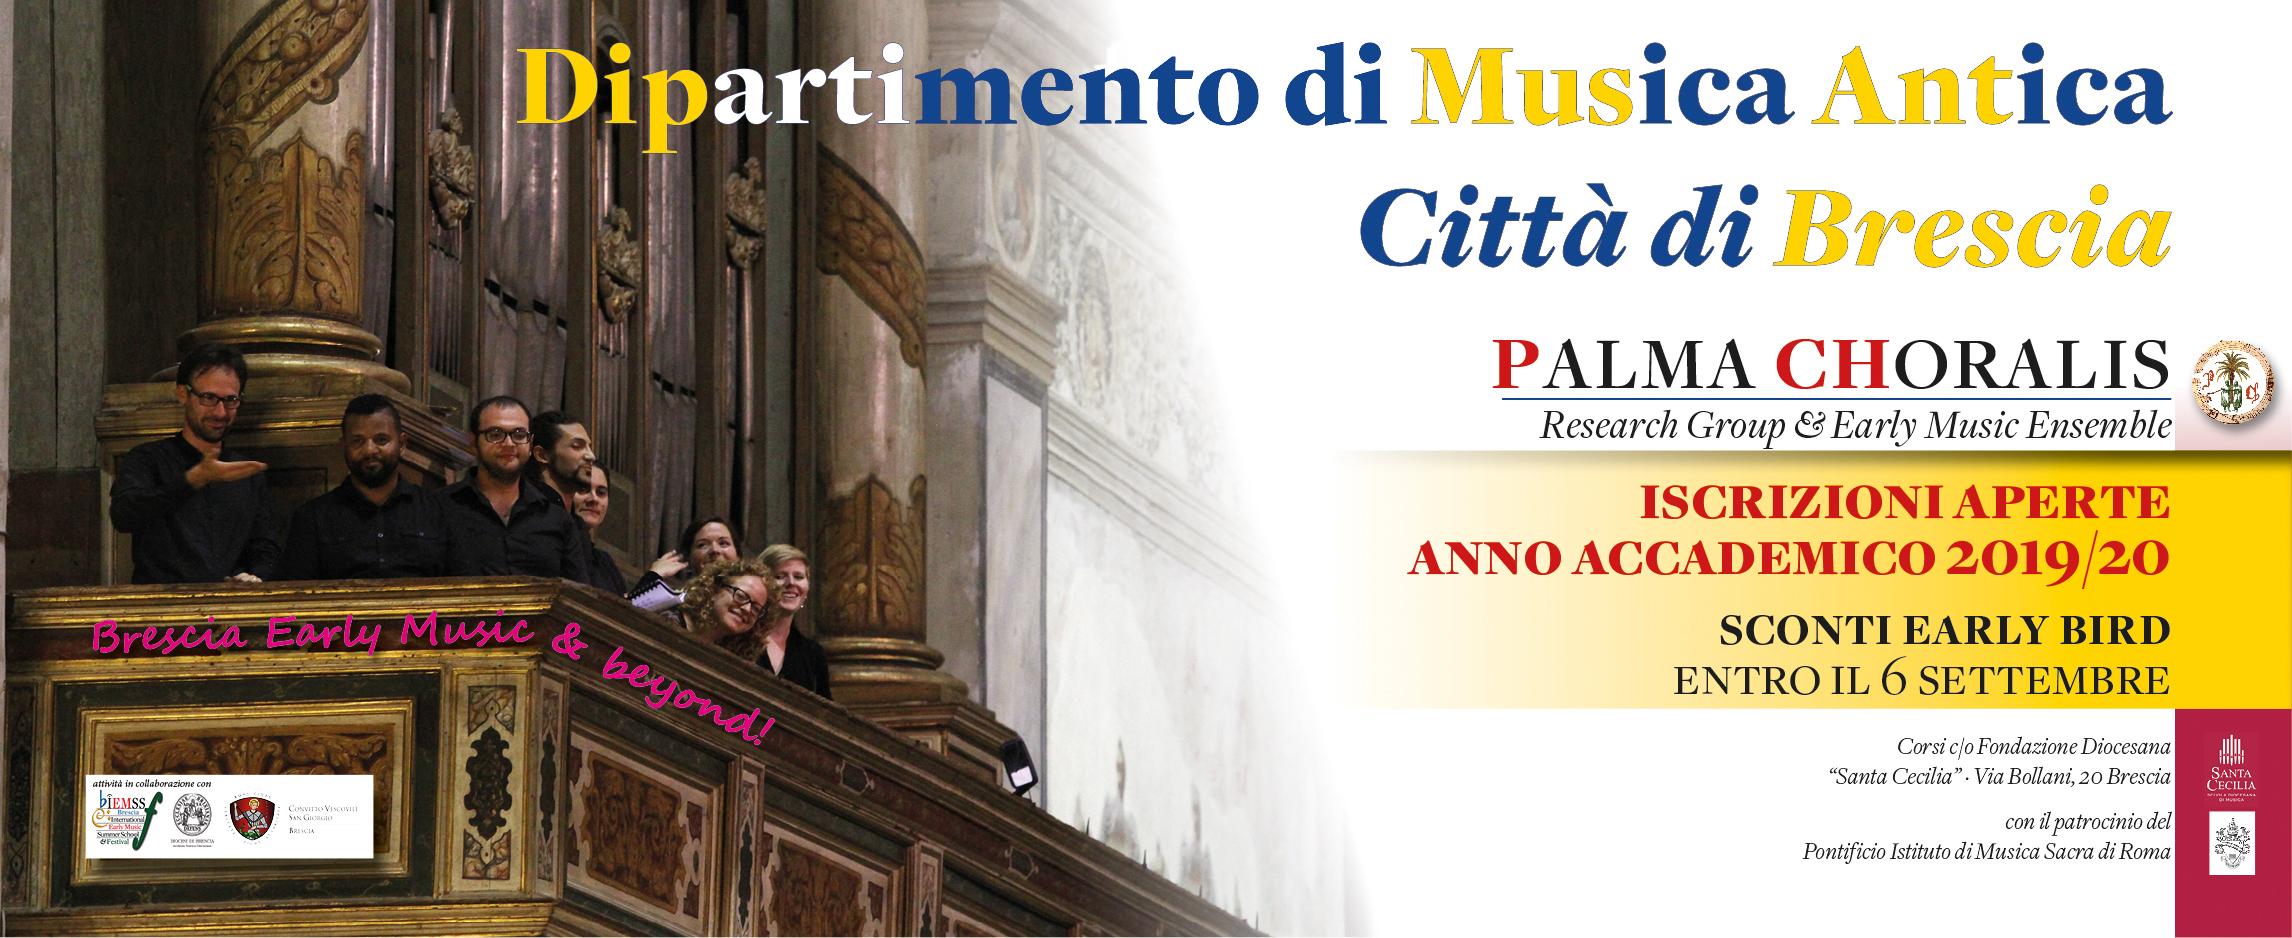 Dipartimento Musica Antica Brescia